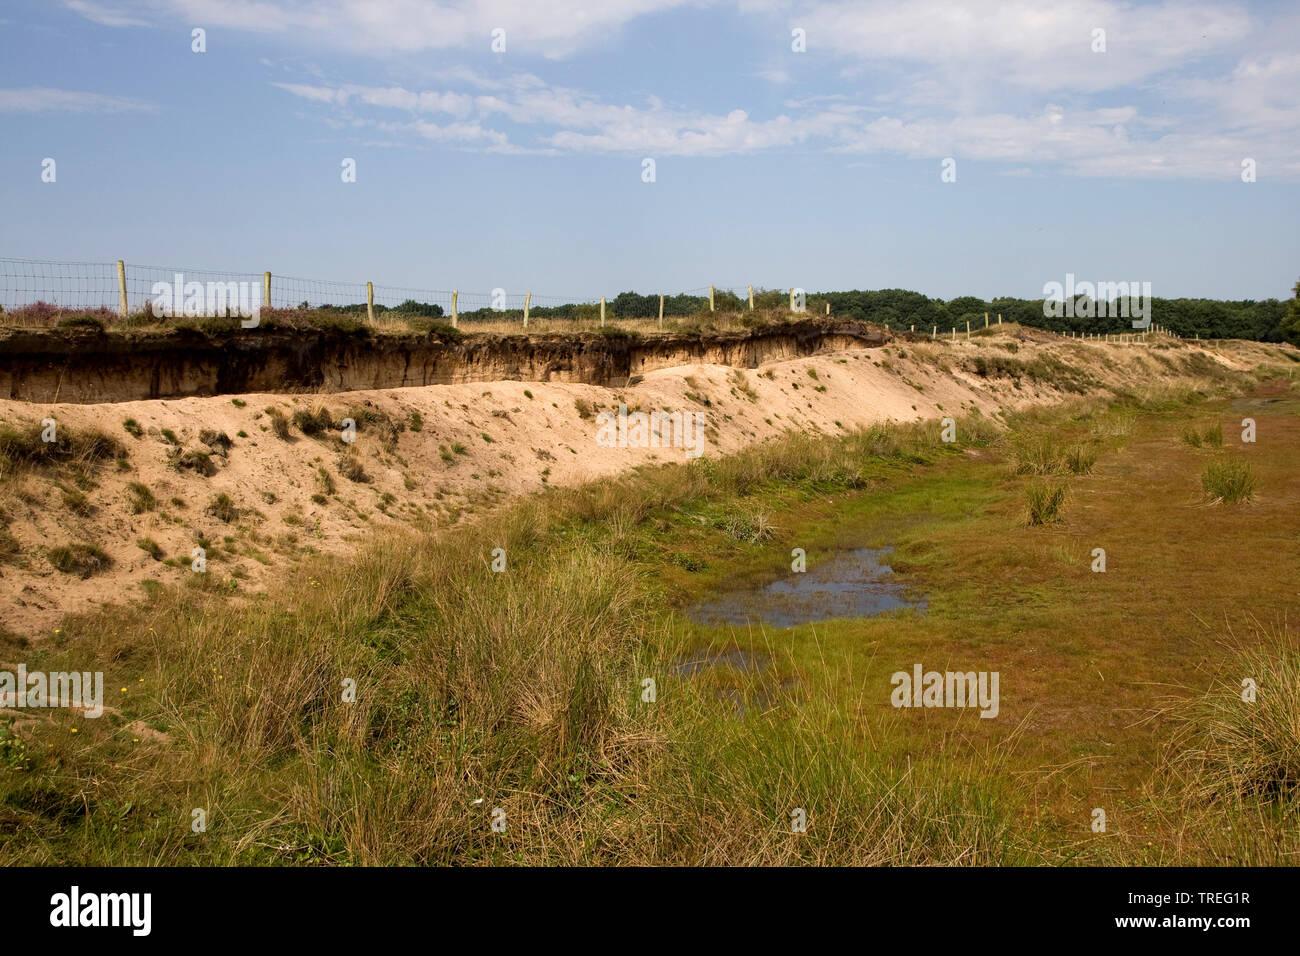 Uferschwalbe, Ufer-Schwalbe (Riparia riparia), Brutwand in Groeve Oostermeent, Niederlande, Utrecht, Blaricum | sand martin (Riparia riparia), breedin - Stock Image